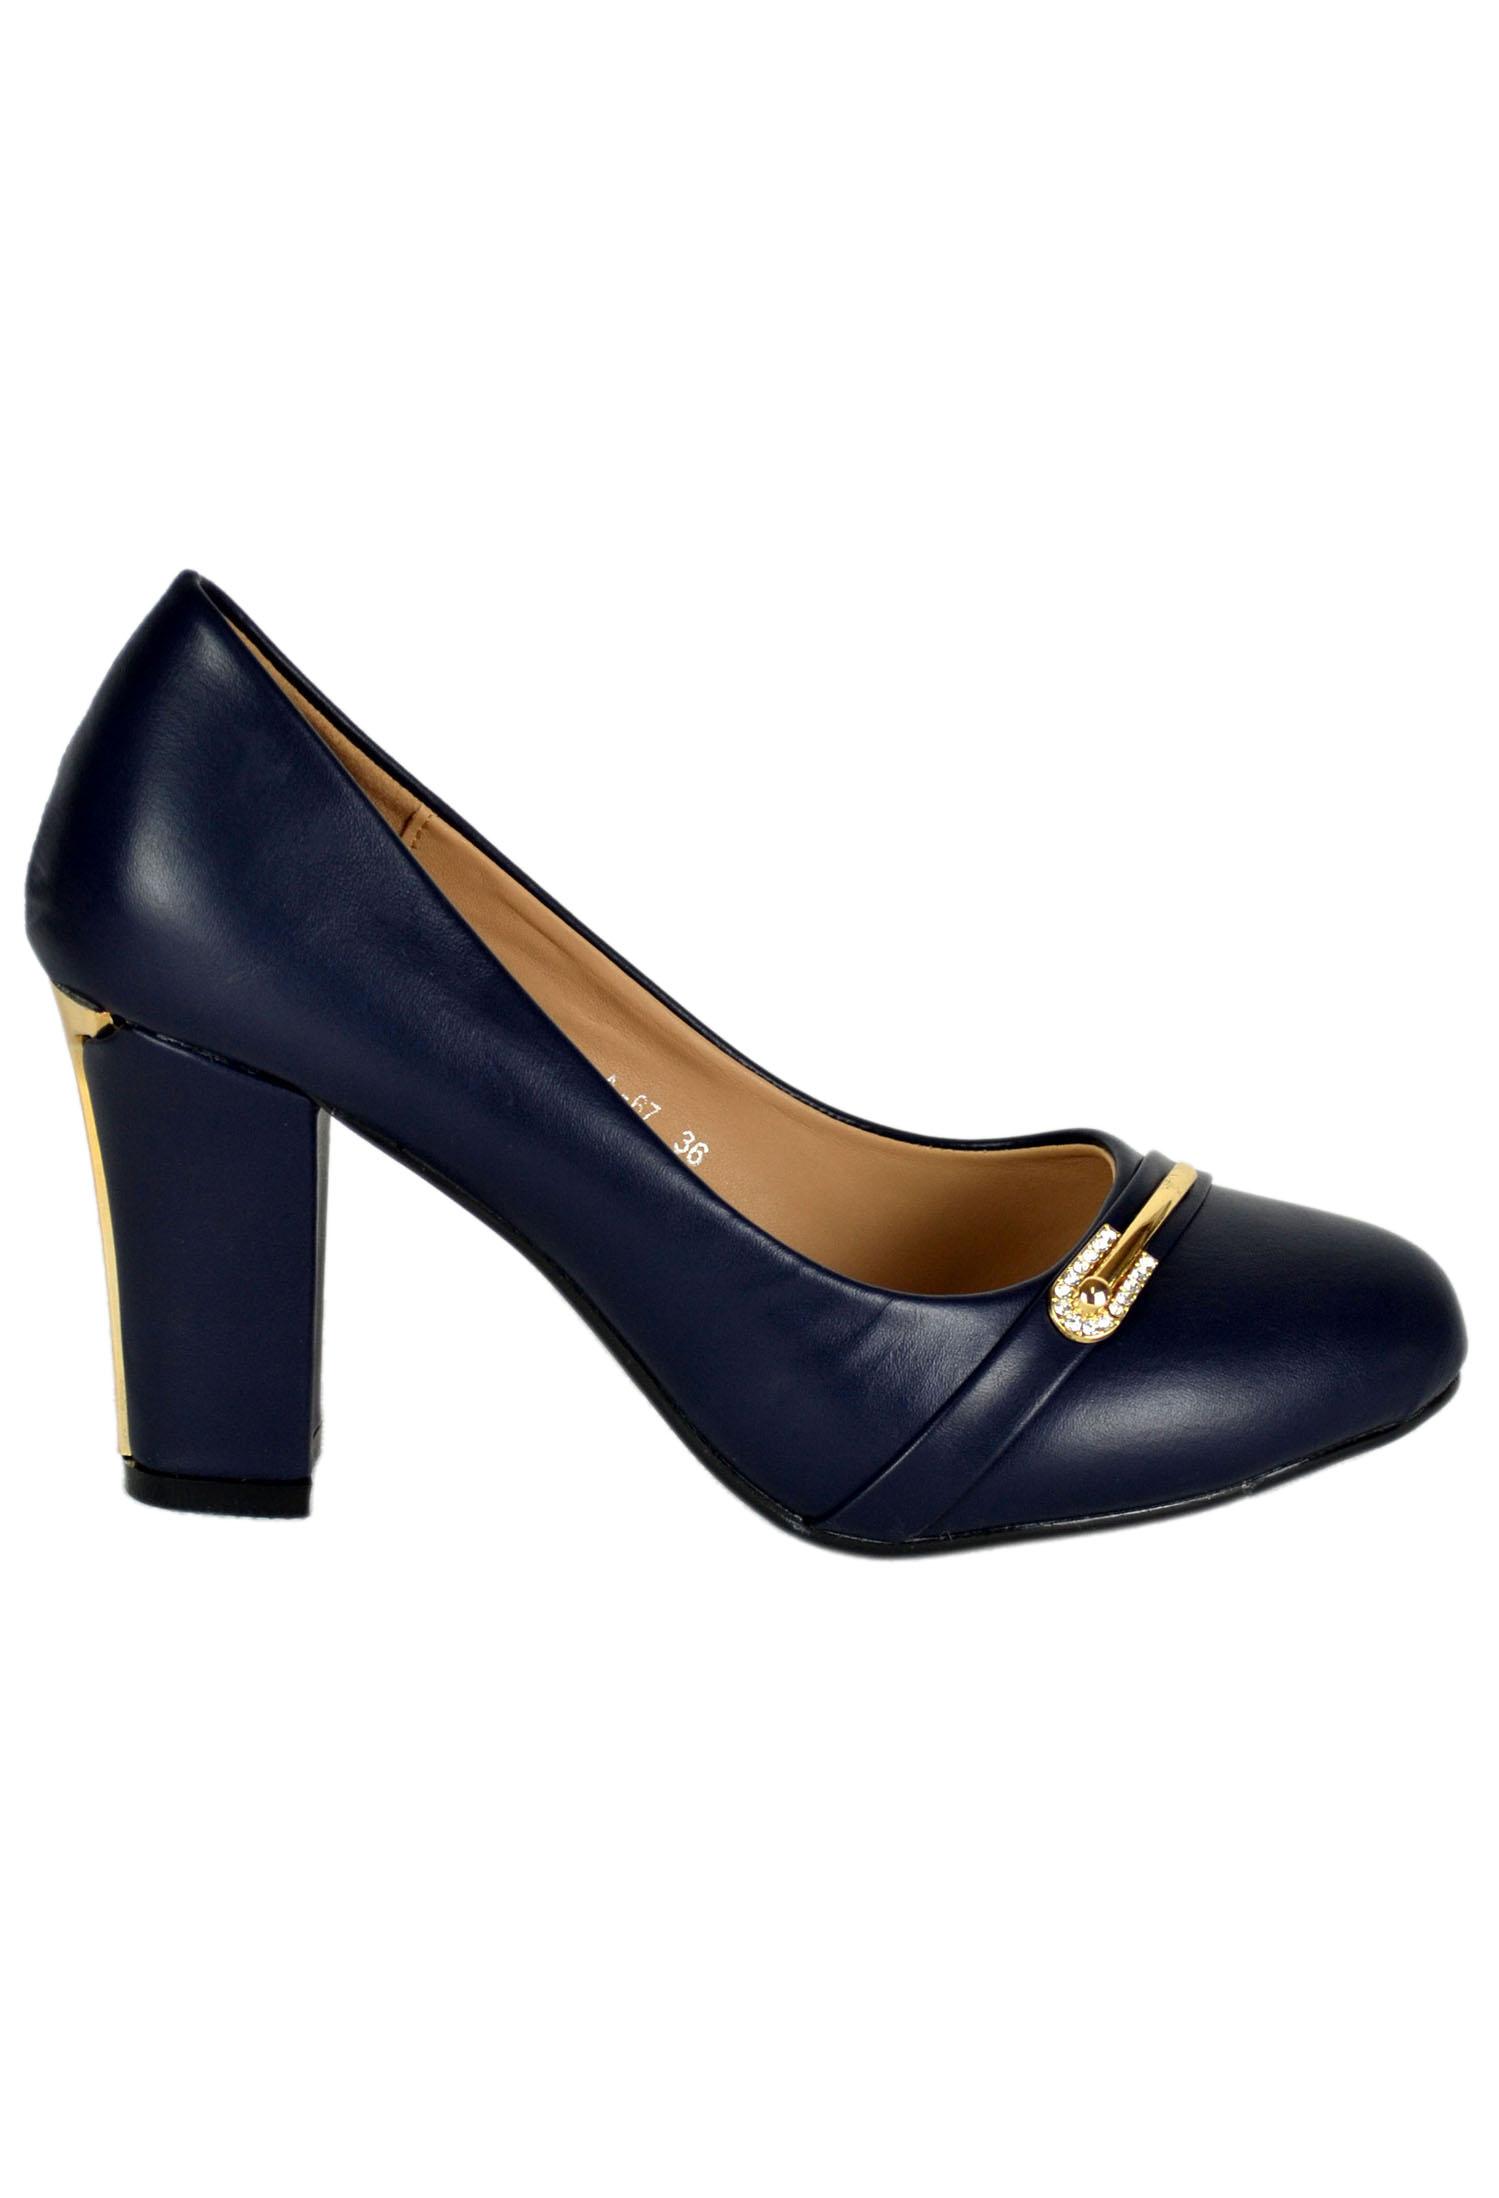 Pantofi DarkBlue #1303